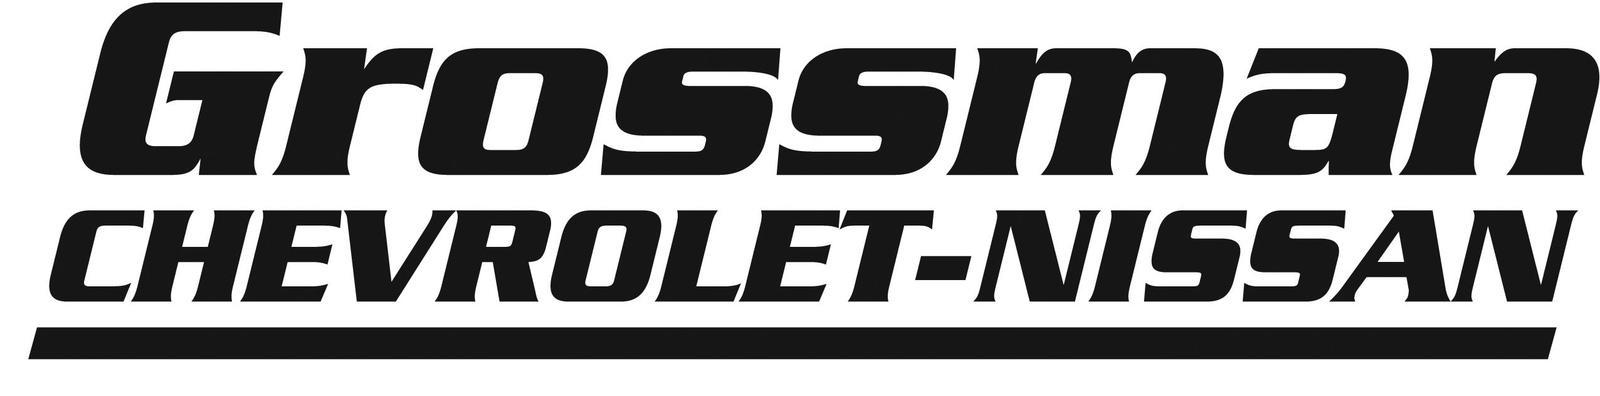 Mazda Dealers In Ct >> Grossman Chevrolet Nissan - Old Saybrook, CT: Read ...